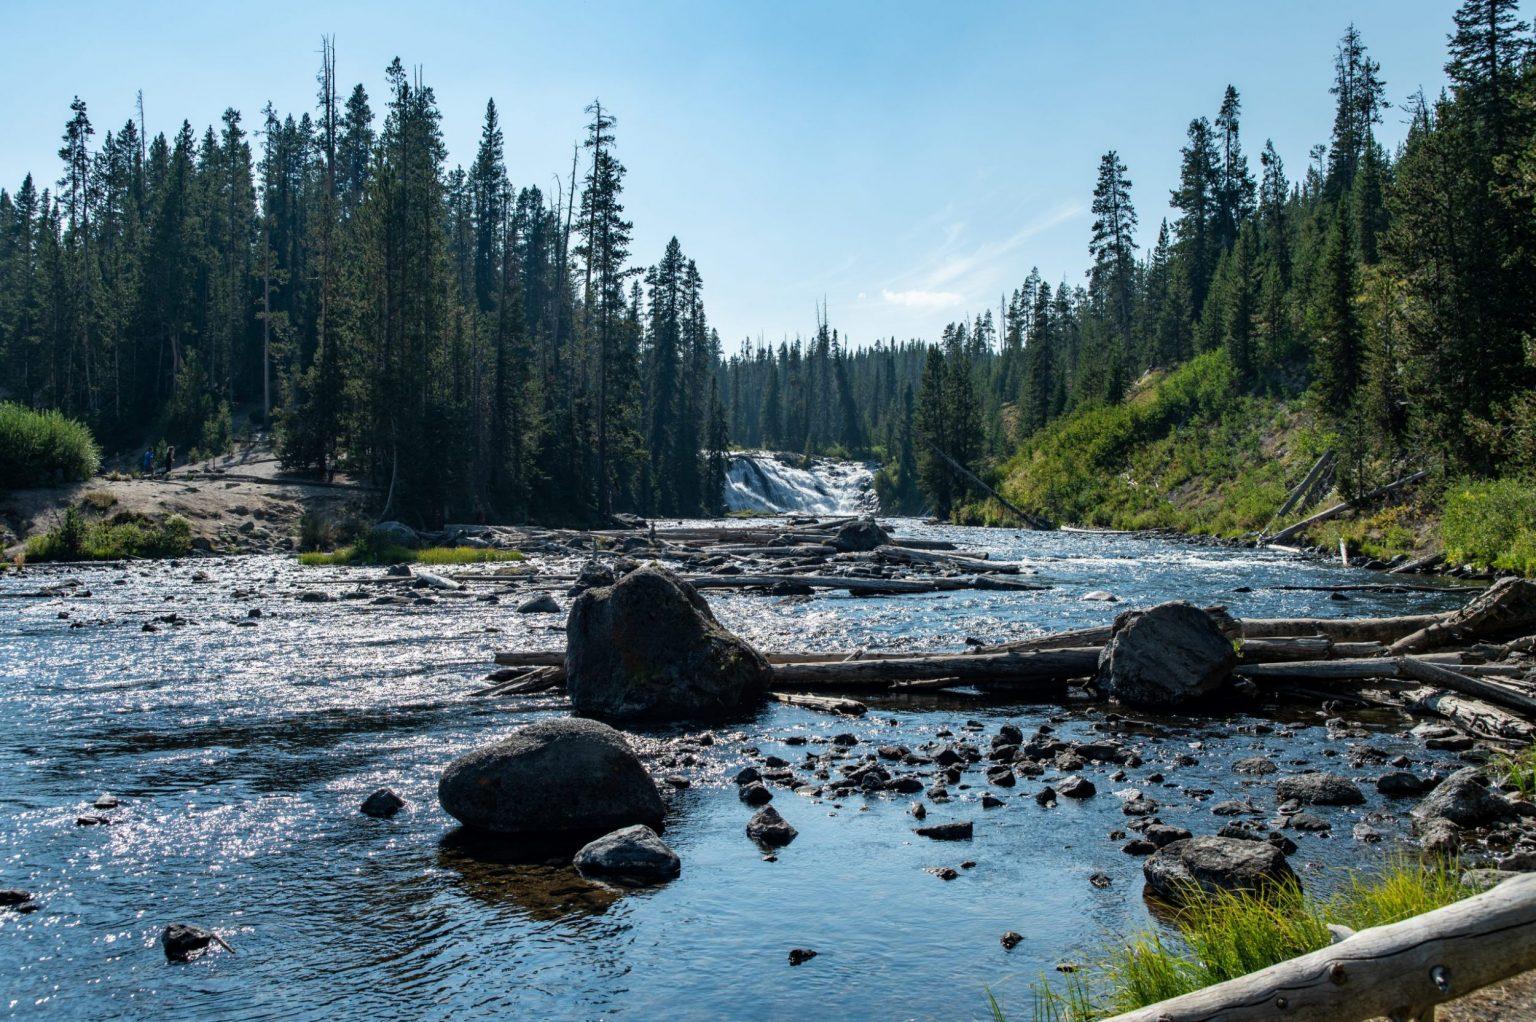 waterfall photo lewis falls yellowstone amsw photography